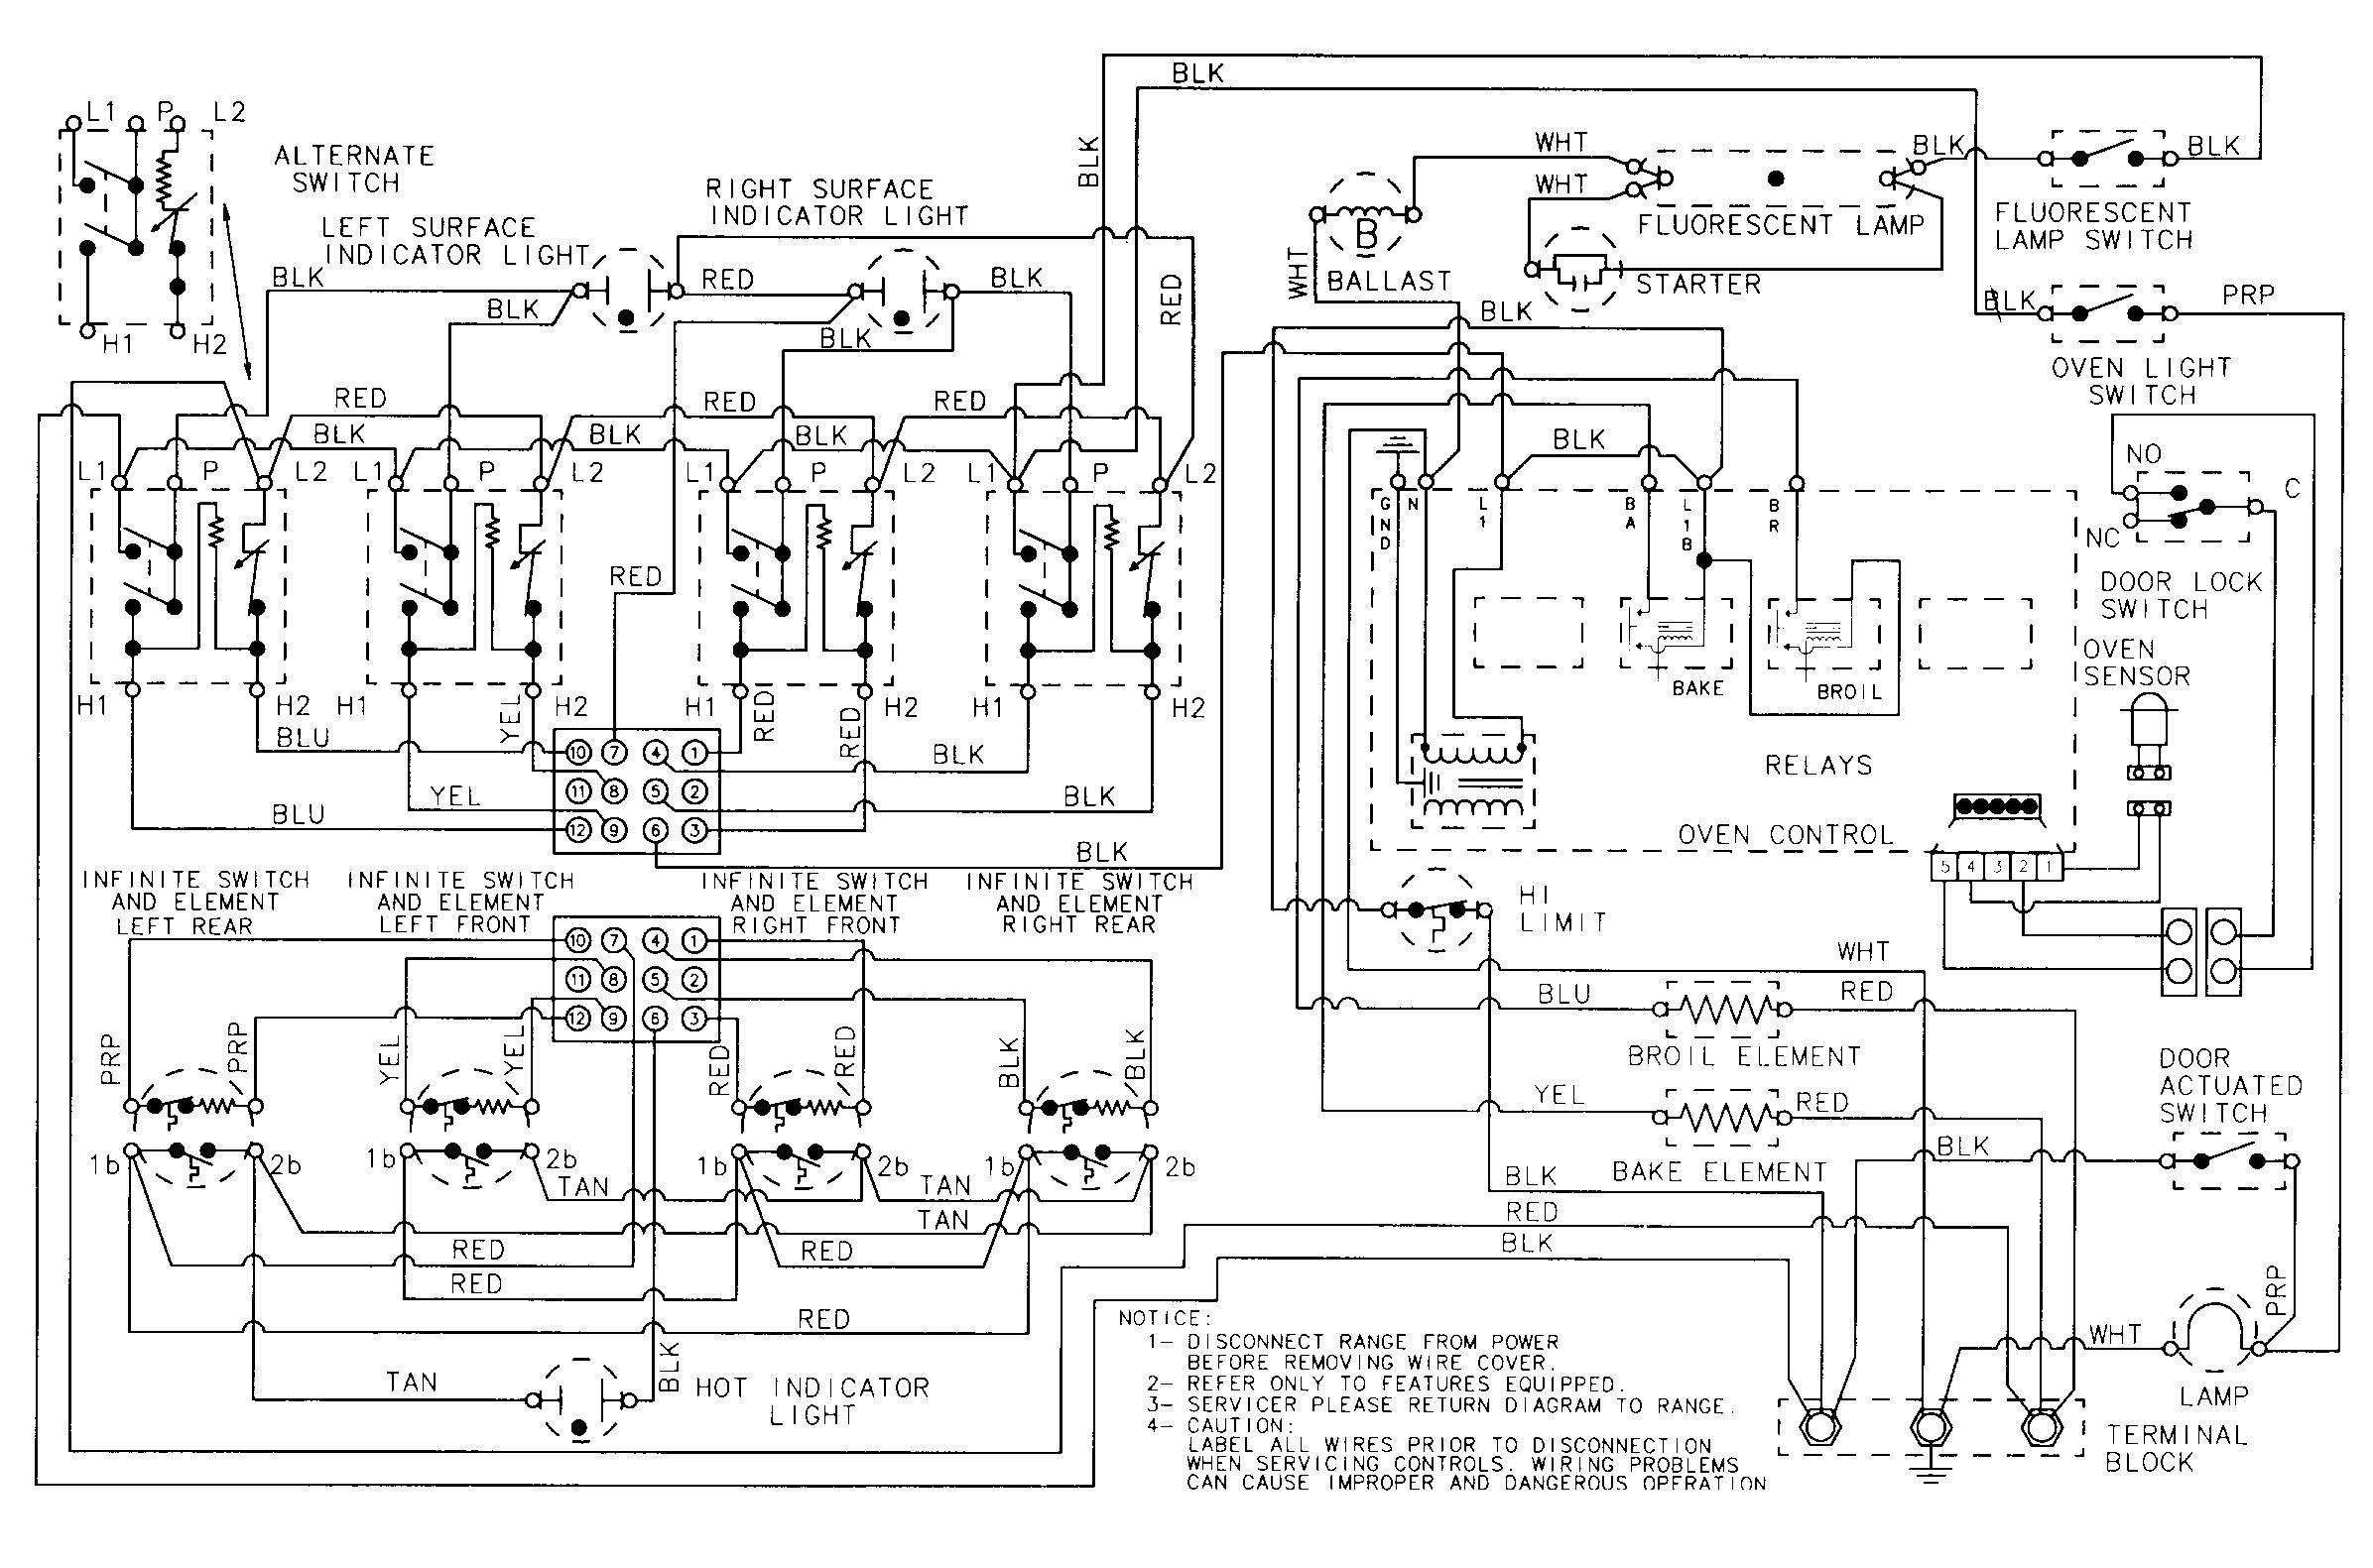 panasonic df66 wire diagram dimmer wiring diagram databaseoven wiring diagram bosch wiring diagram centre panasonic df66 [ 2392 x 1581 Pixel ]